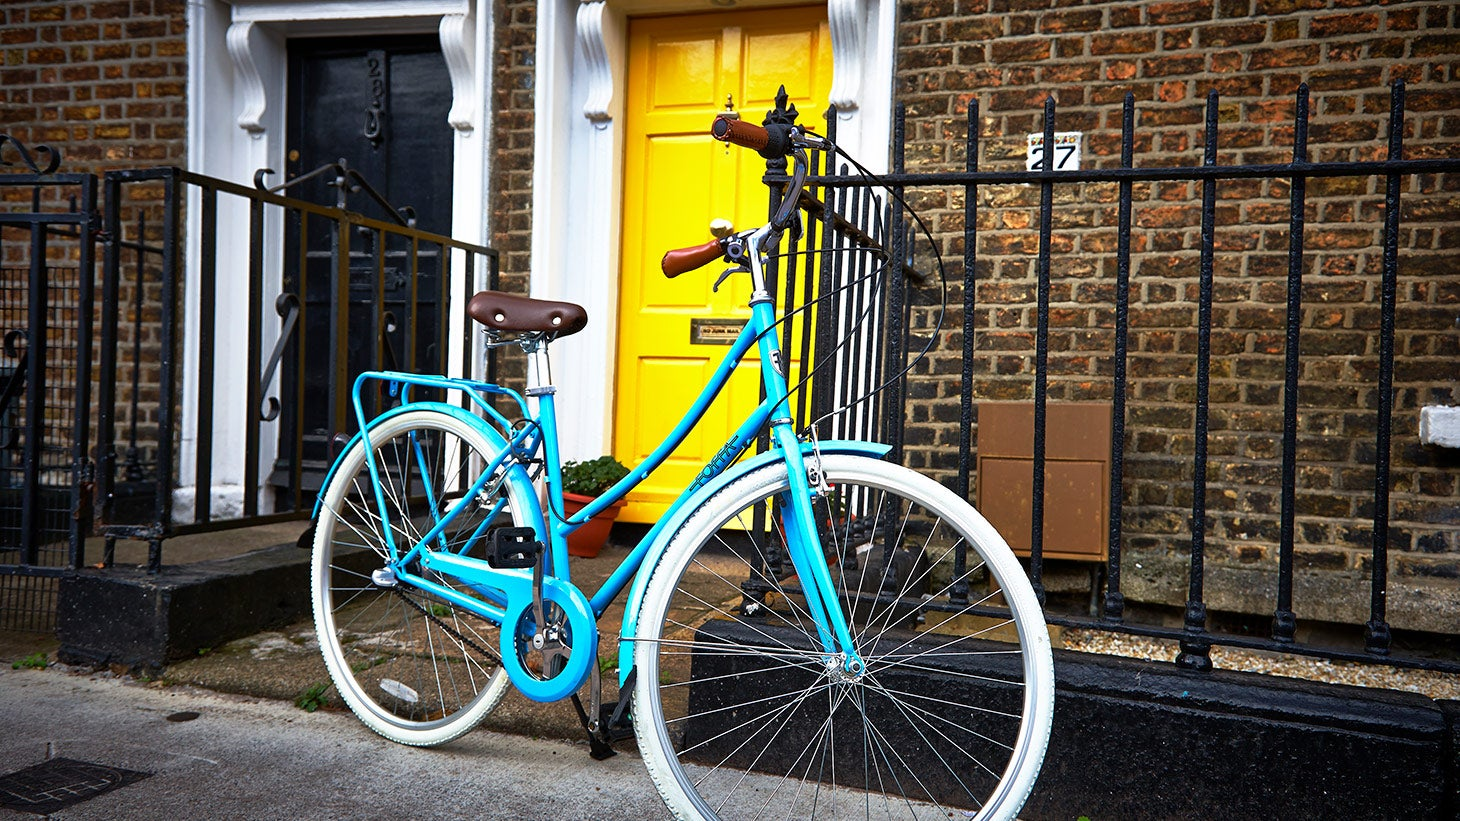 Explore Dublin City Center by bike.